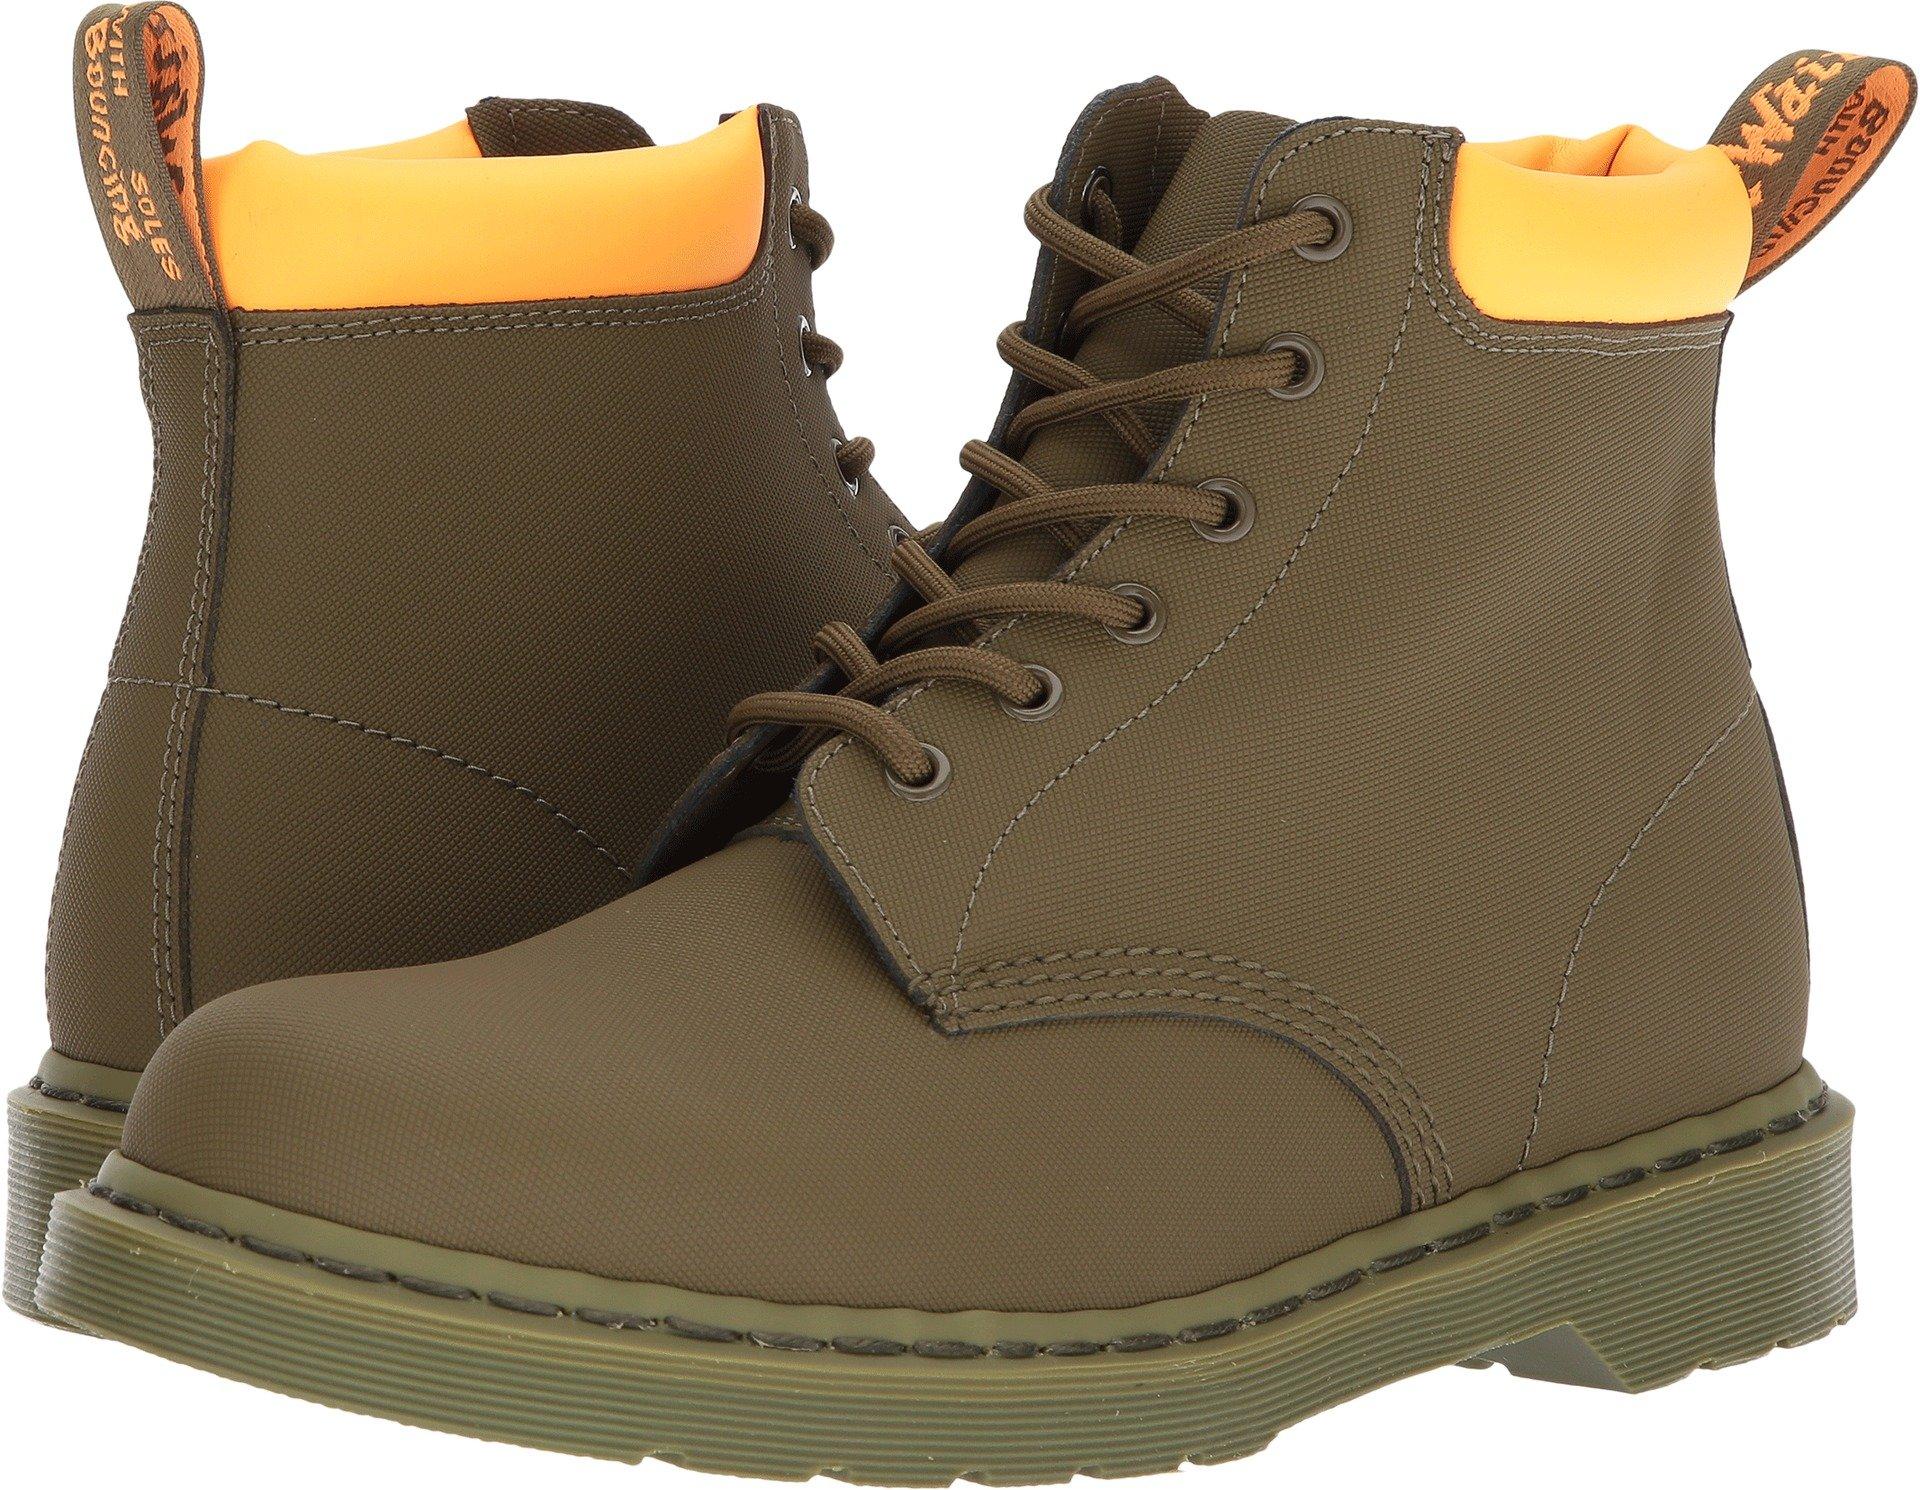 Dr. Martens Men's 939 6-Eye Padded Collar Boots, Olive, Leather, 9 M UK, 10 M US